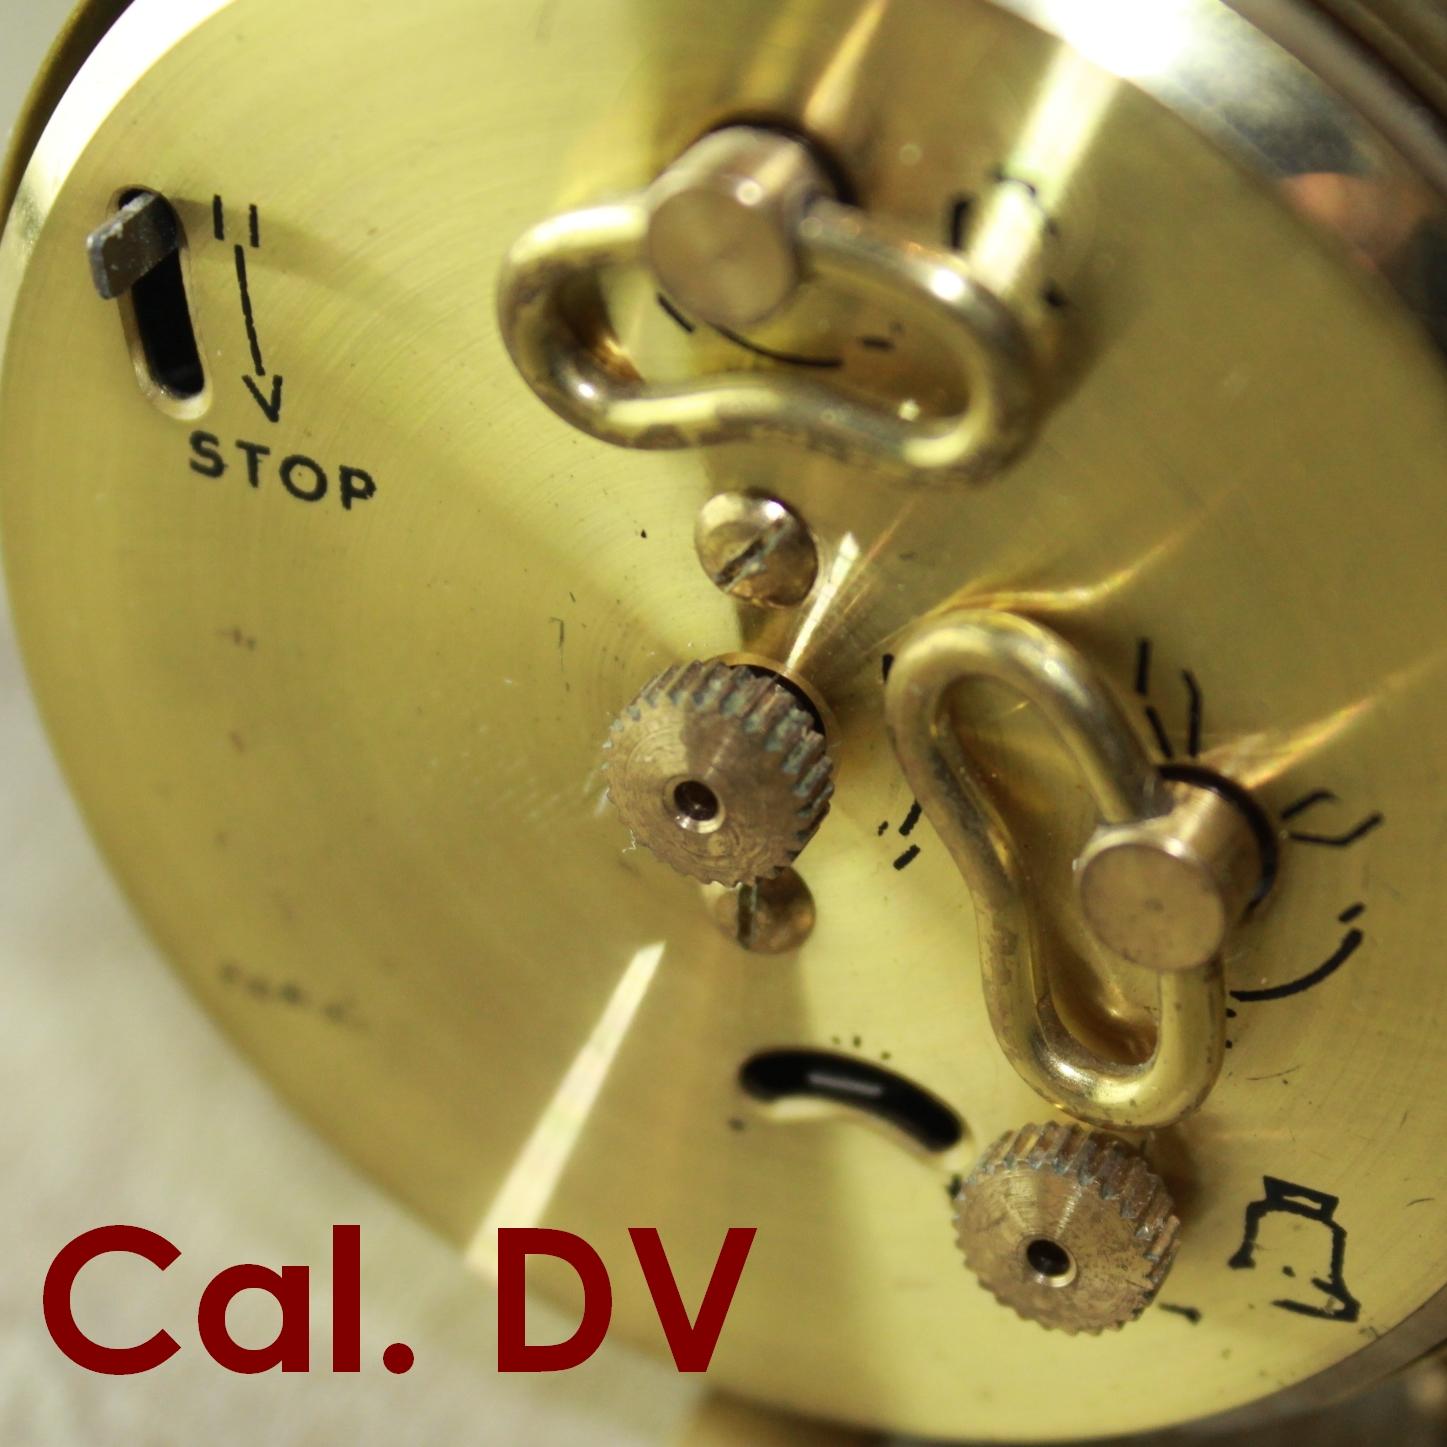 calibre DV